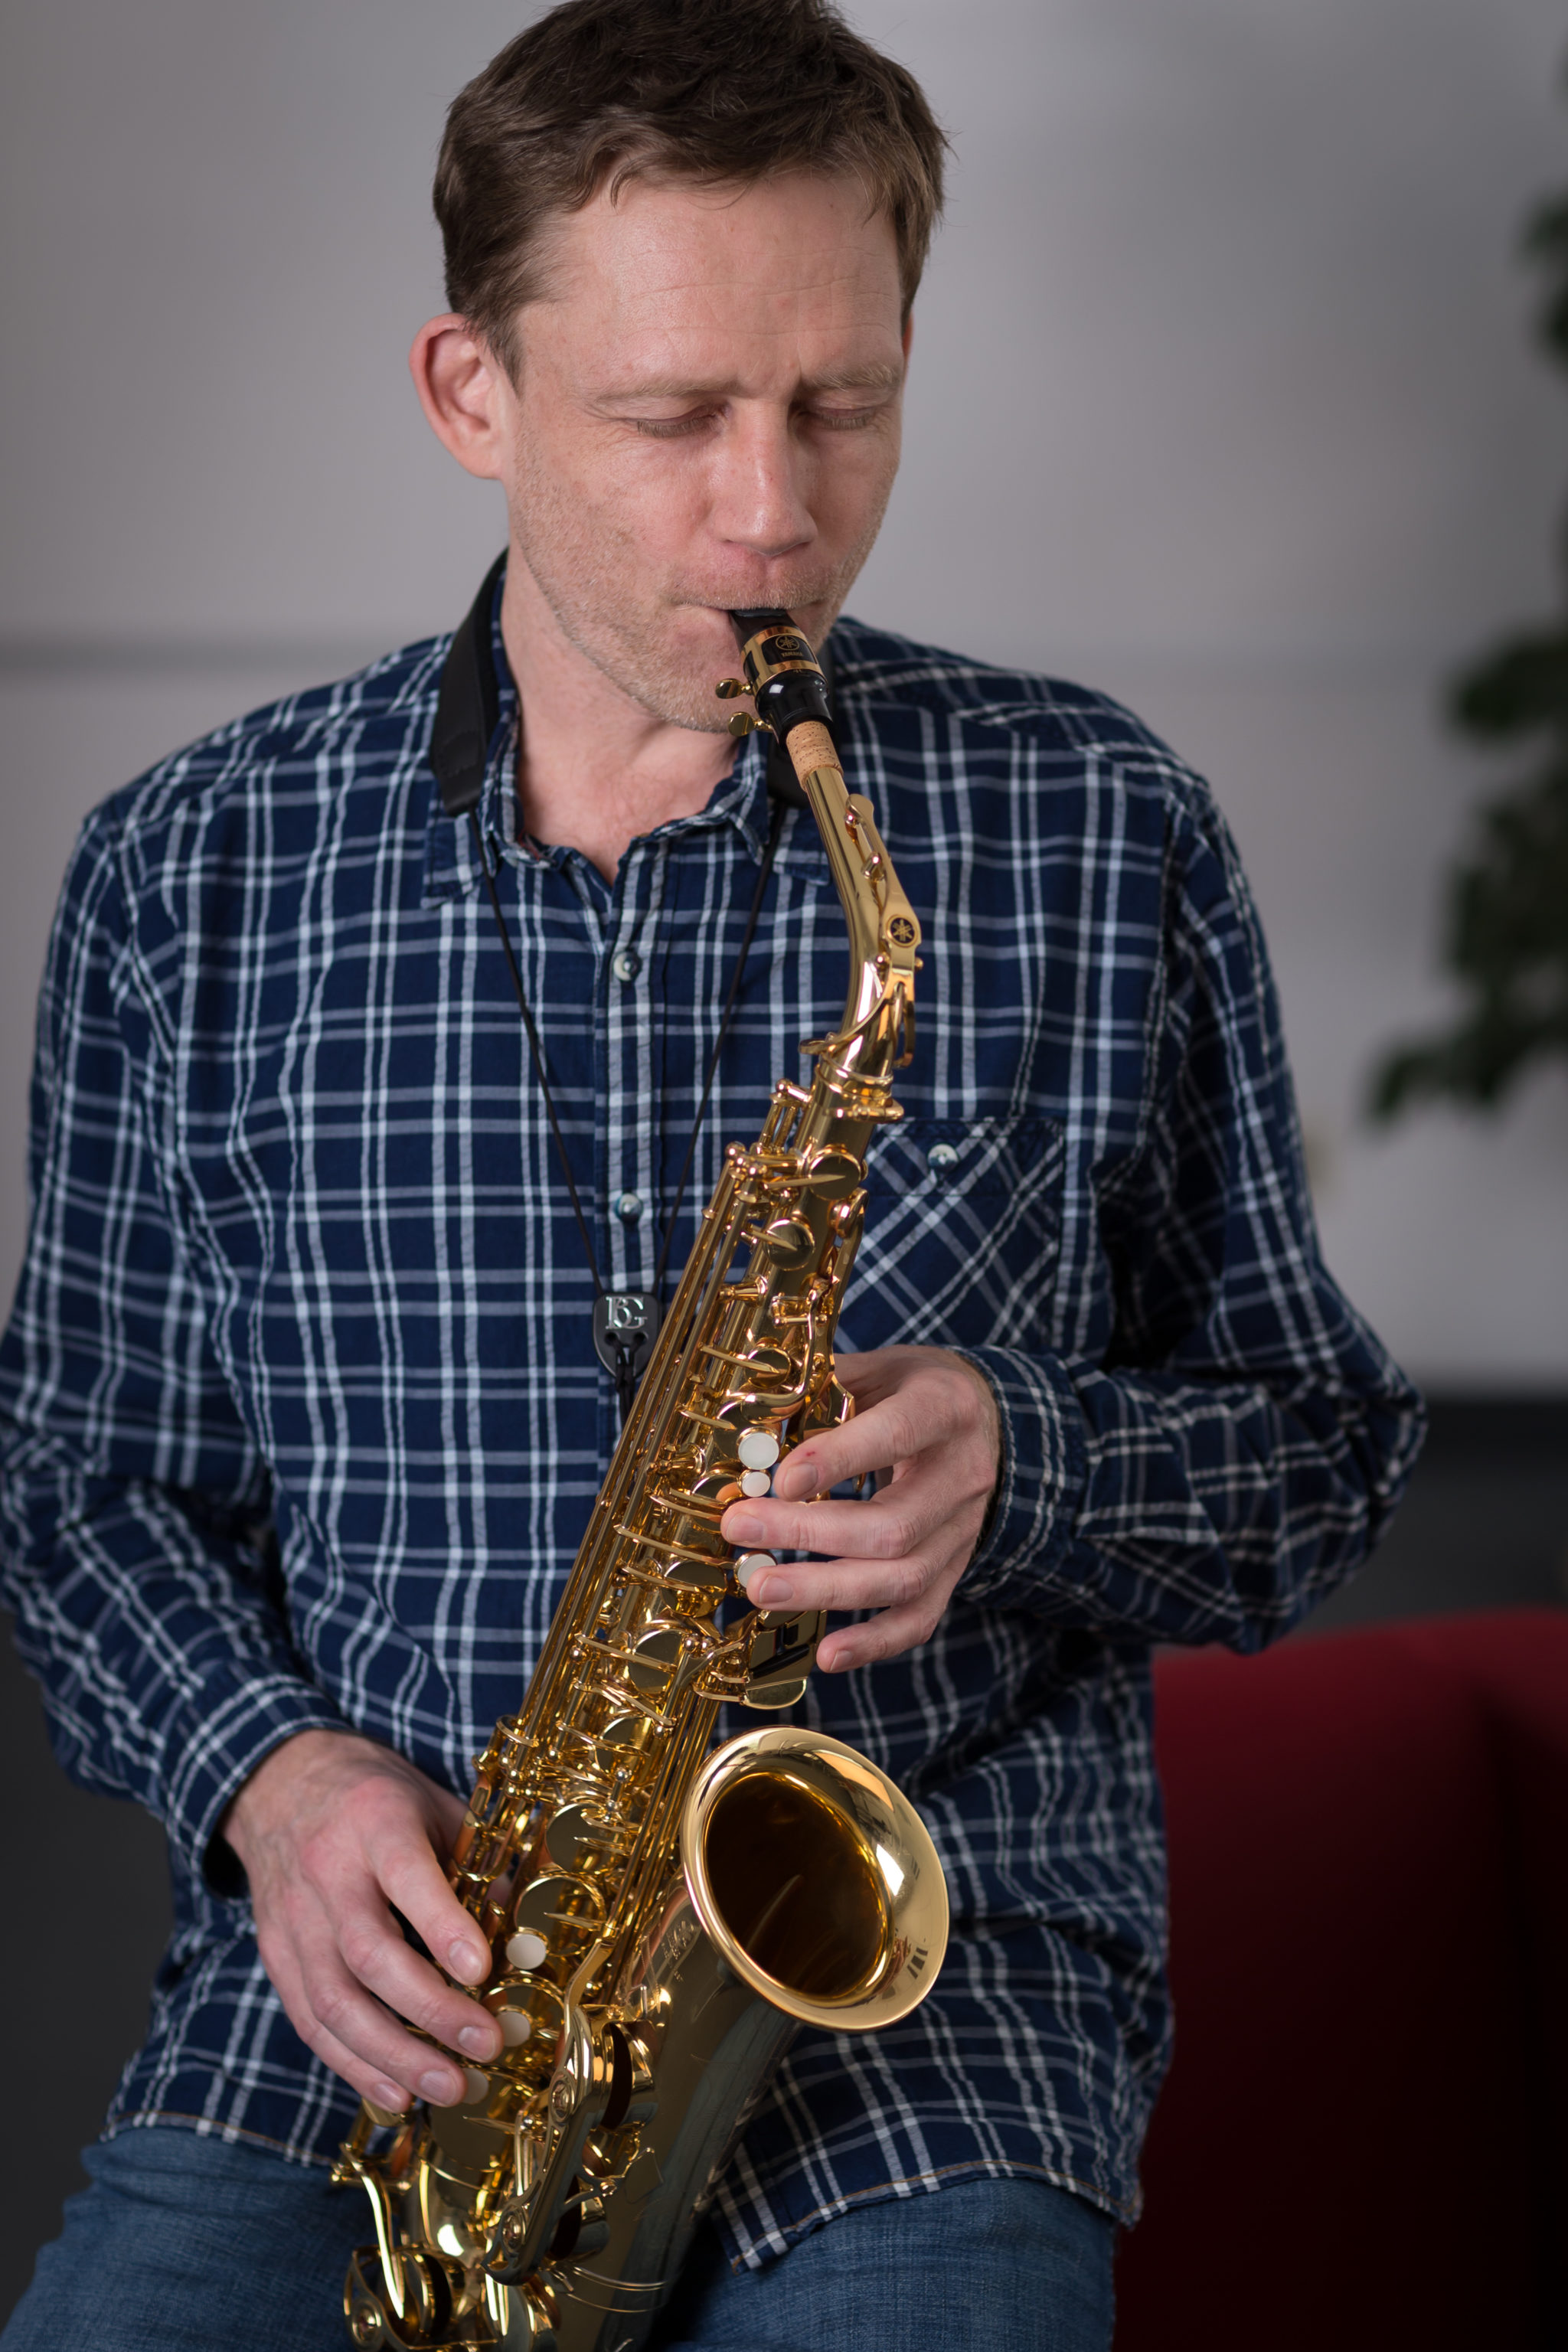 Michal Hrabovec Anasoft